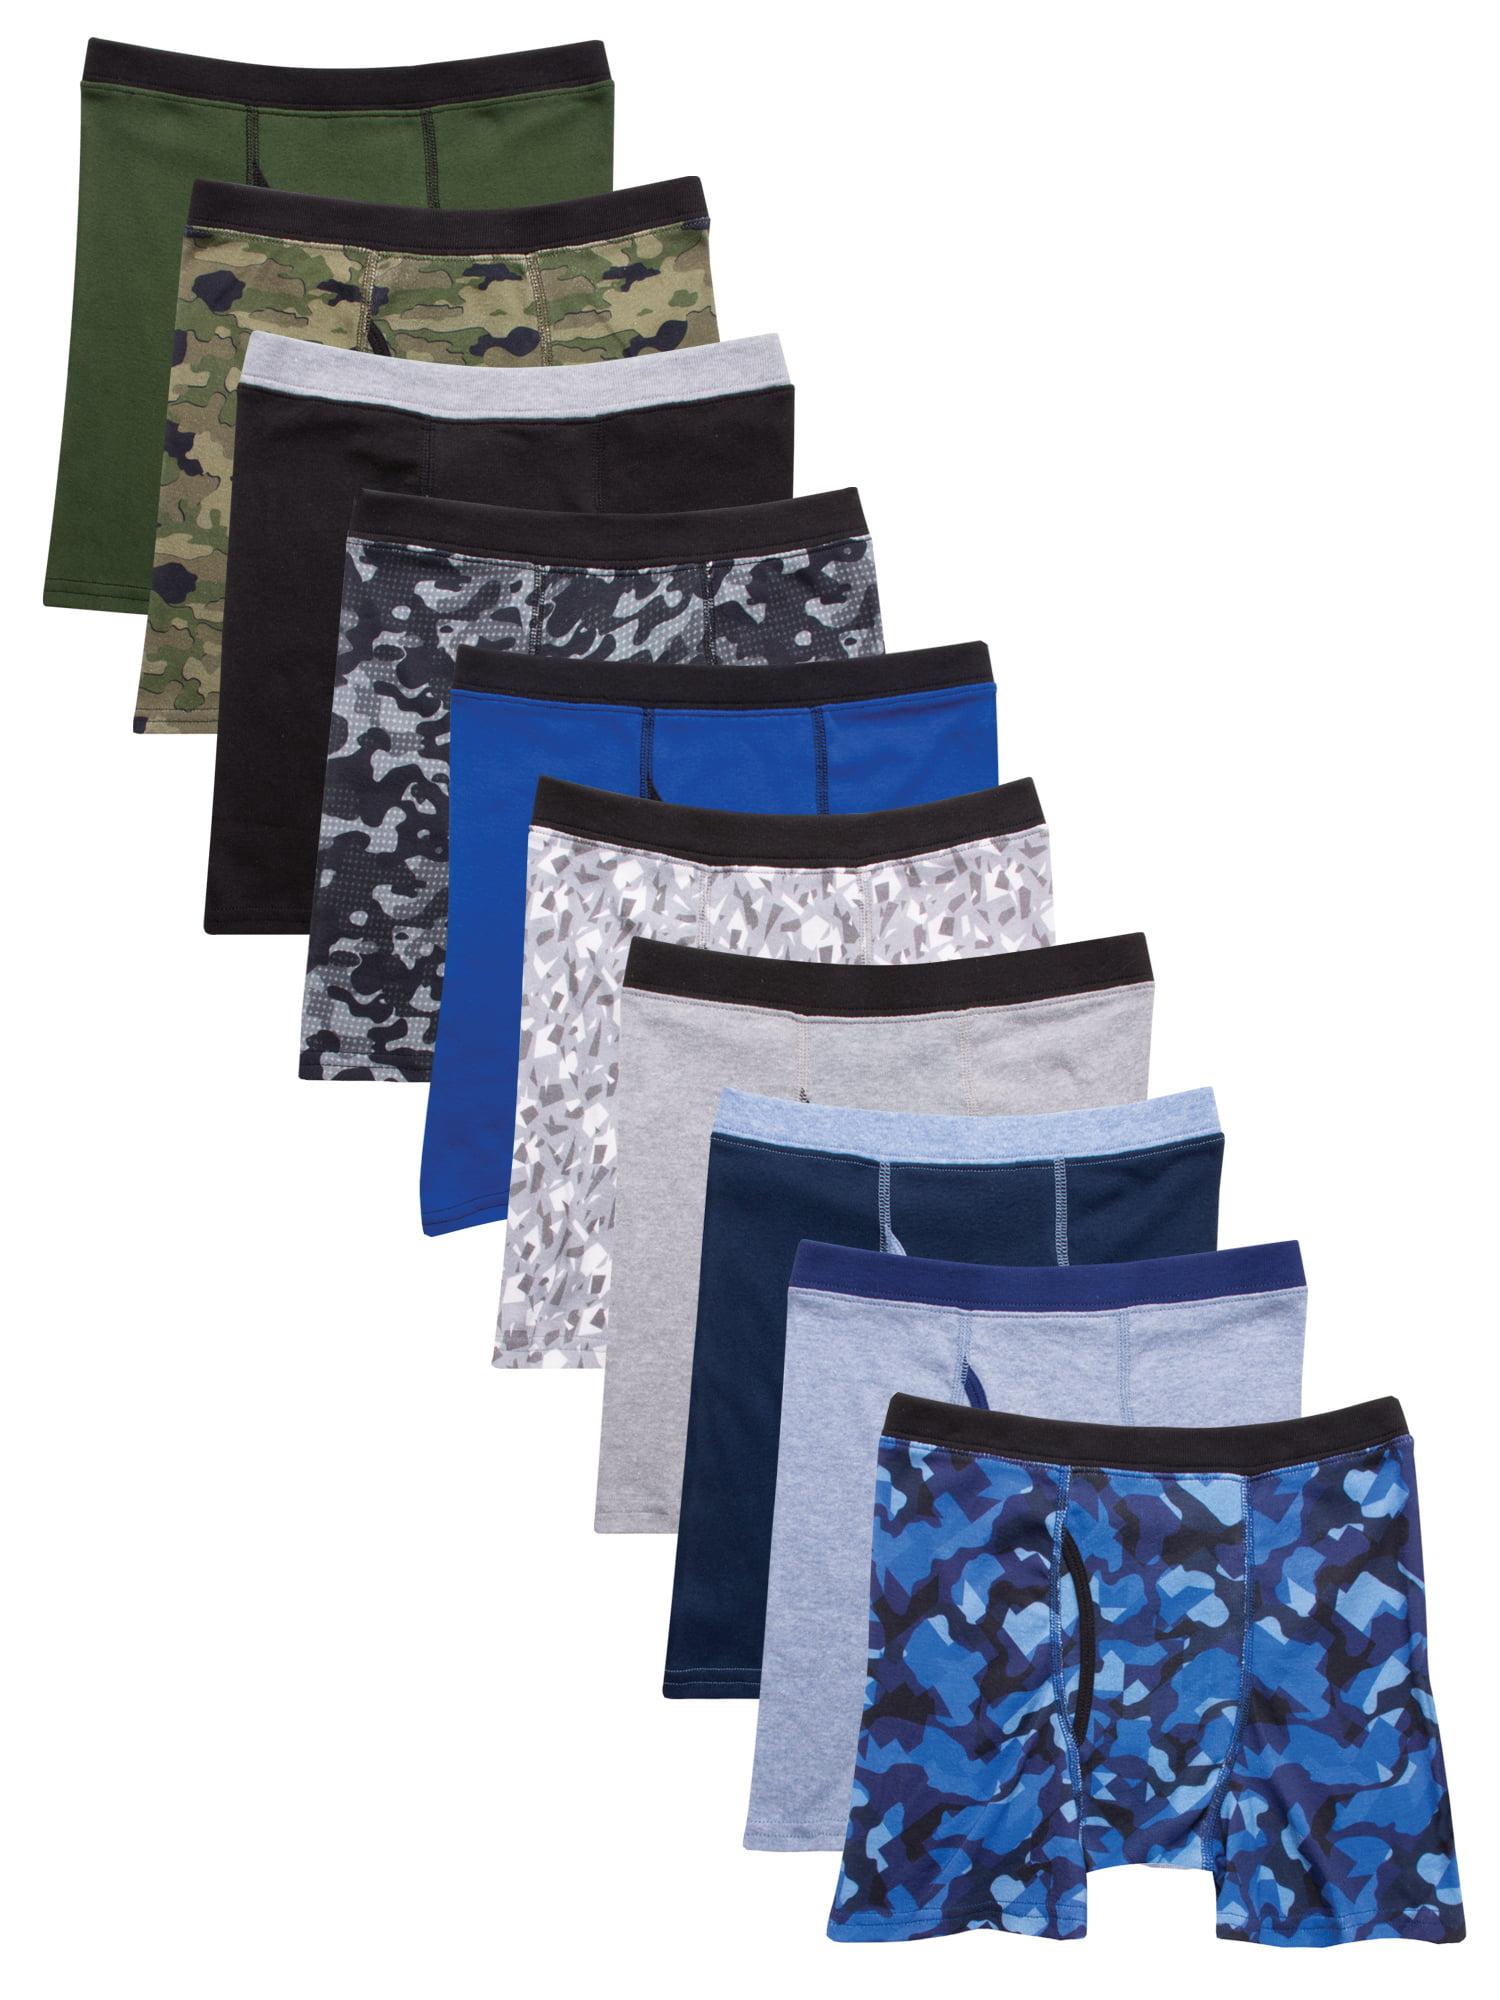 Hanes Boys' 10pk Camo Soft Comfort Boxer Briefs - Colors Vary S